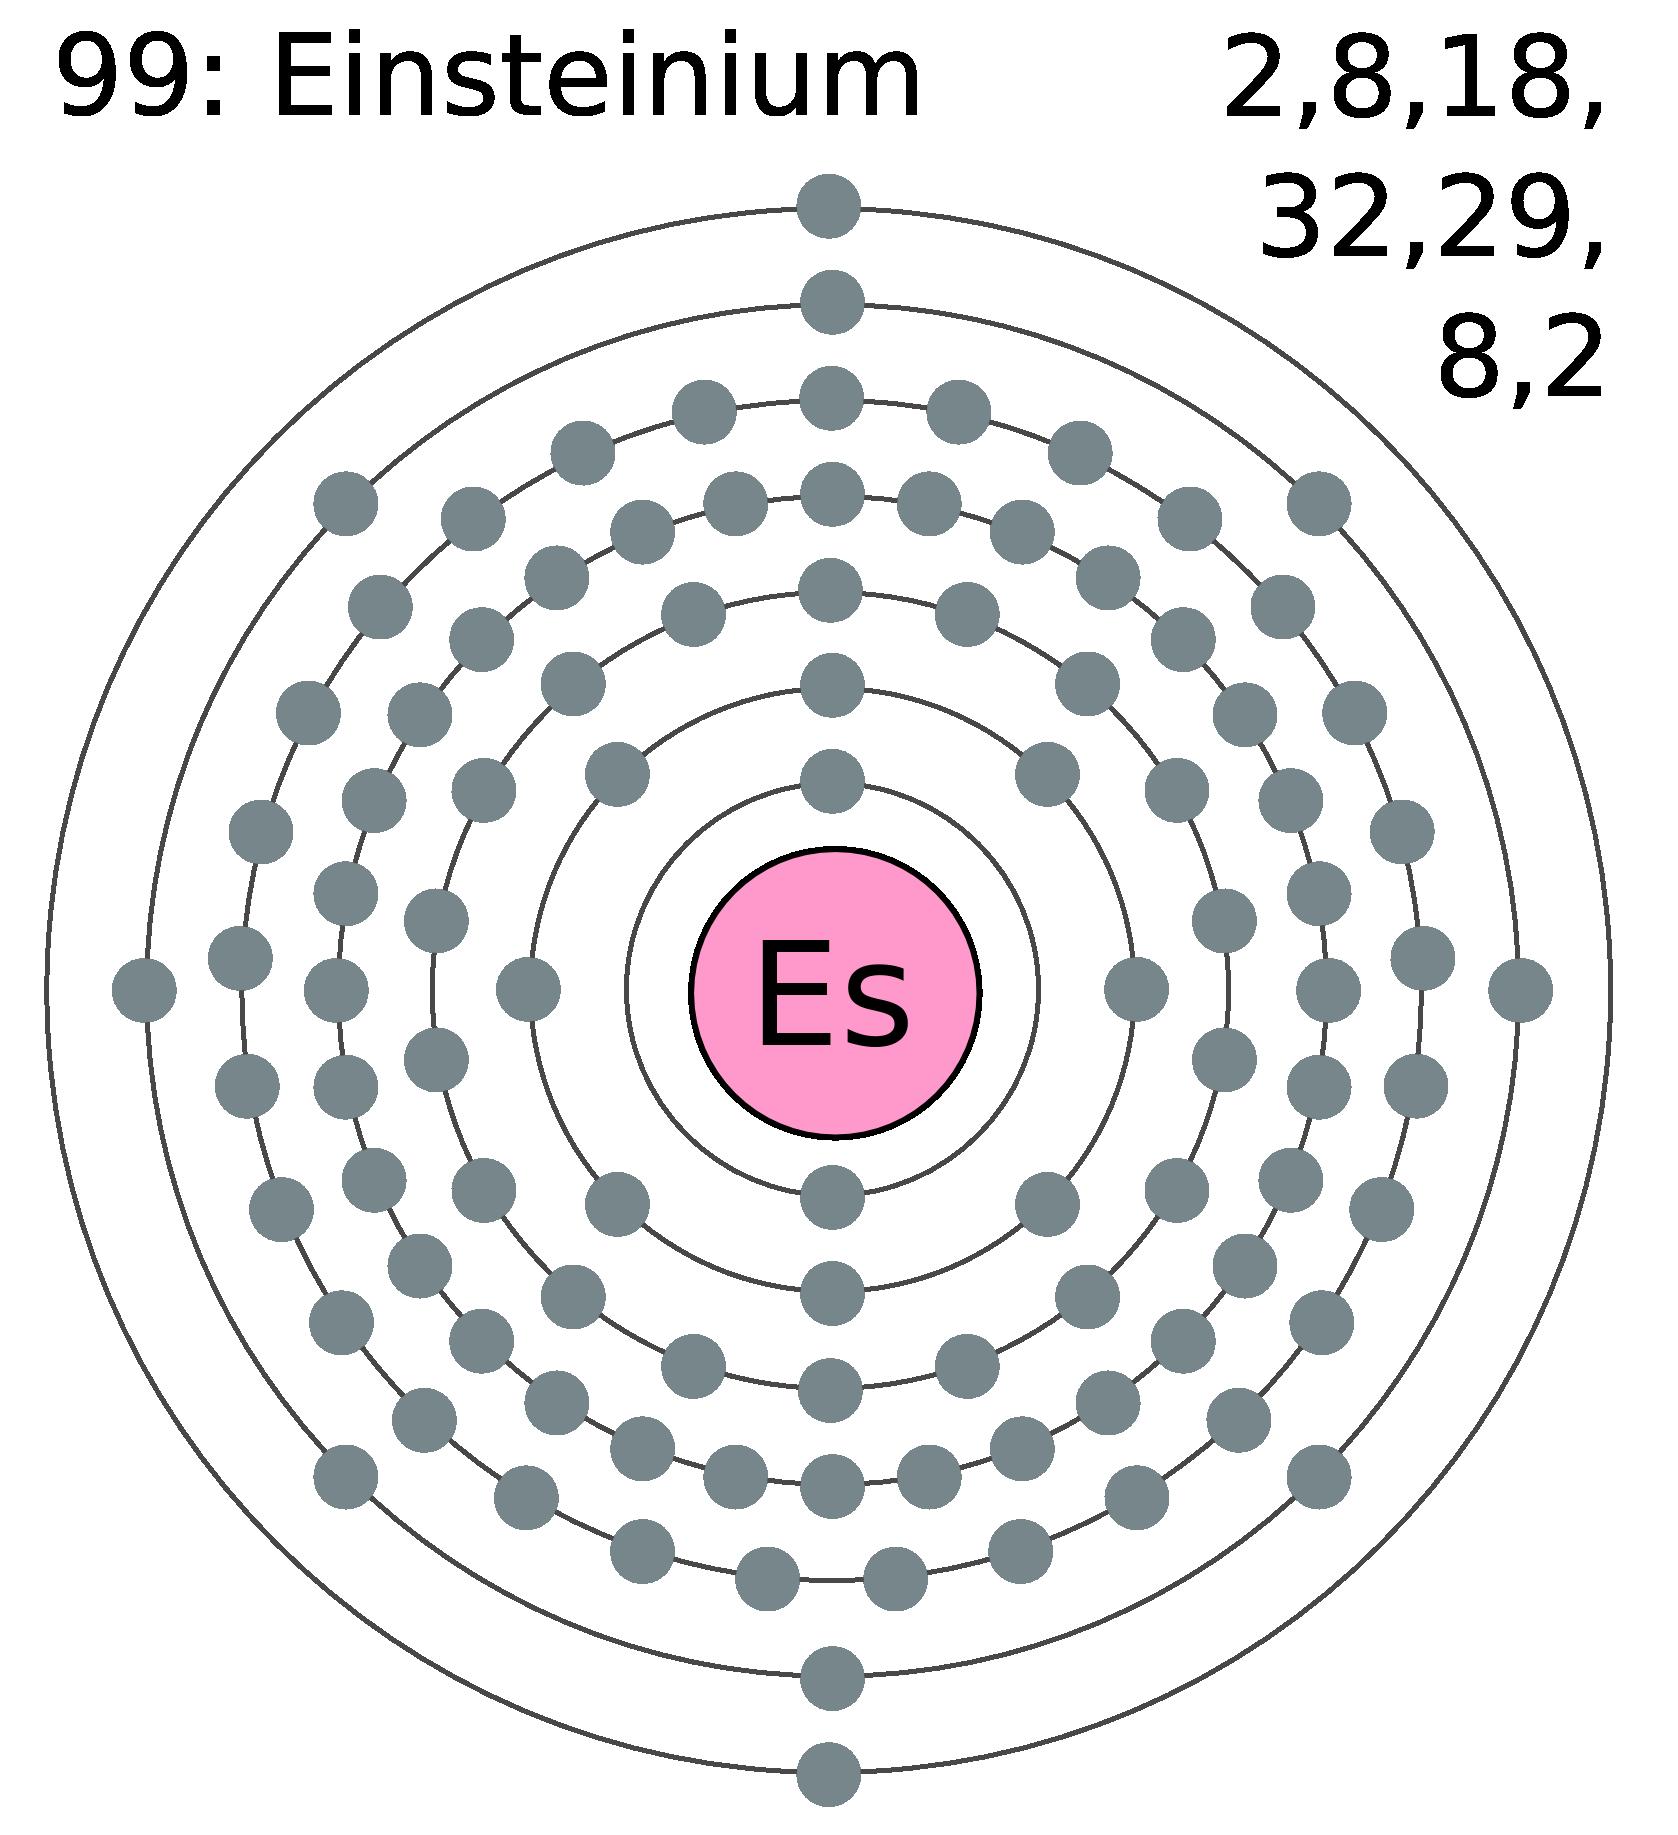 「Es」 「アインスタイニウム」